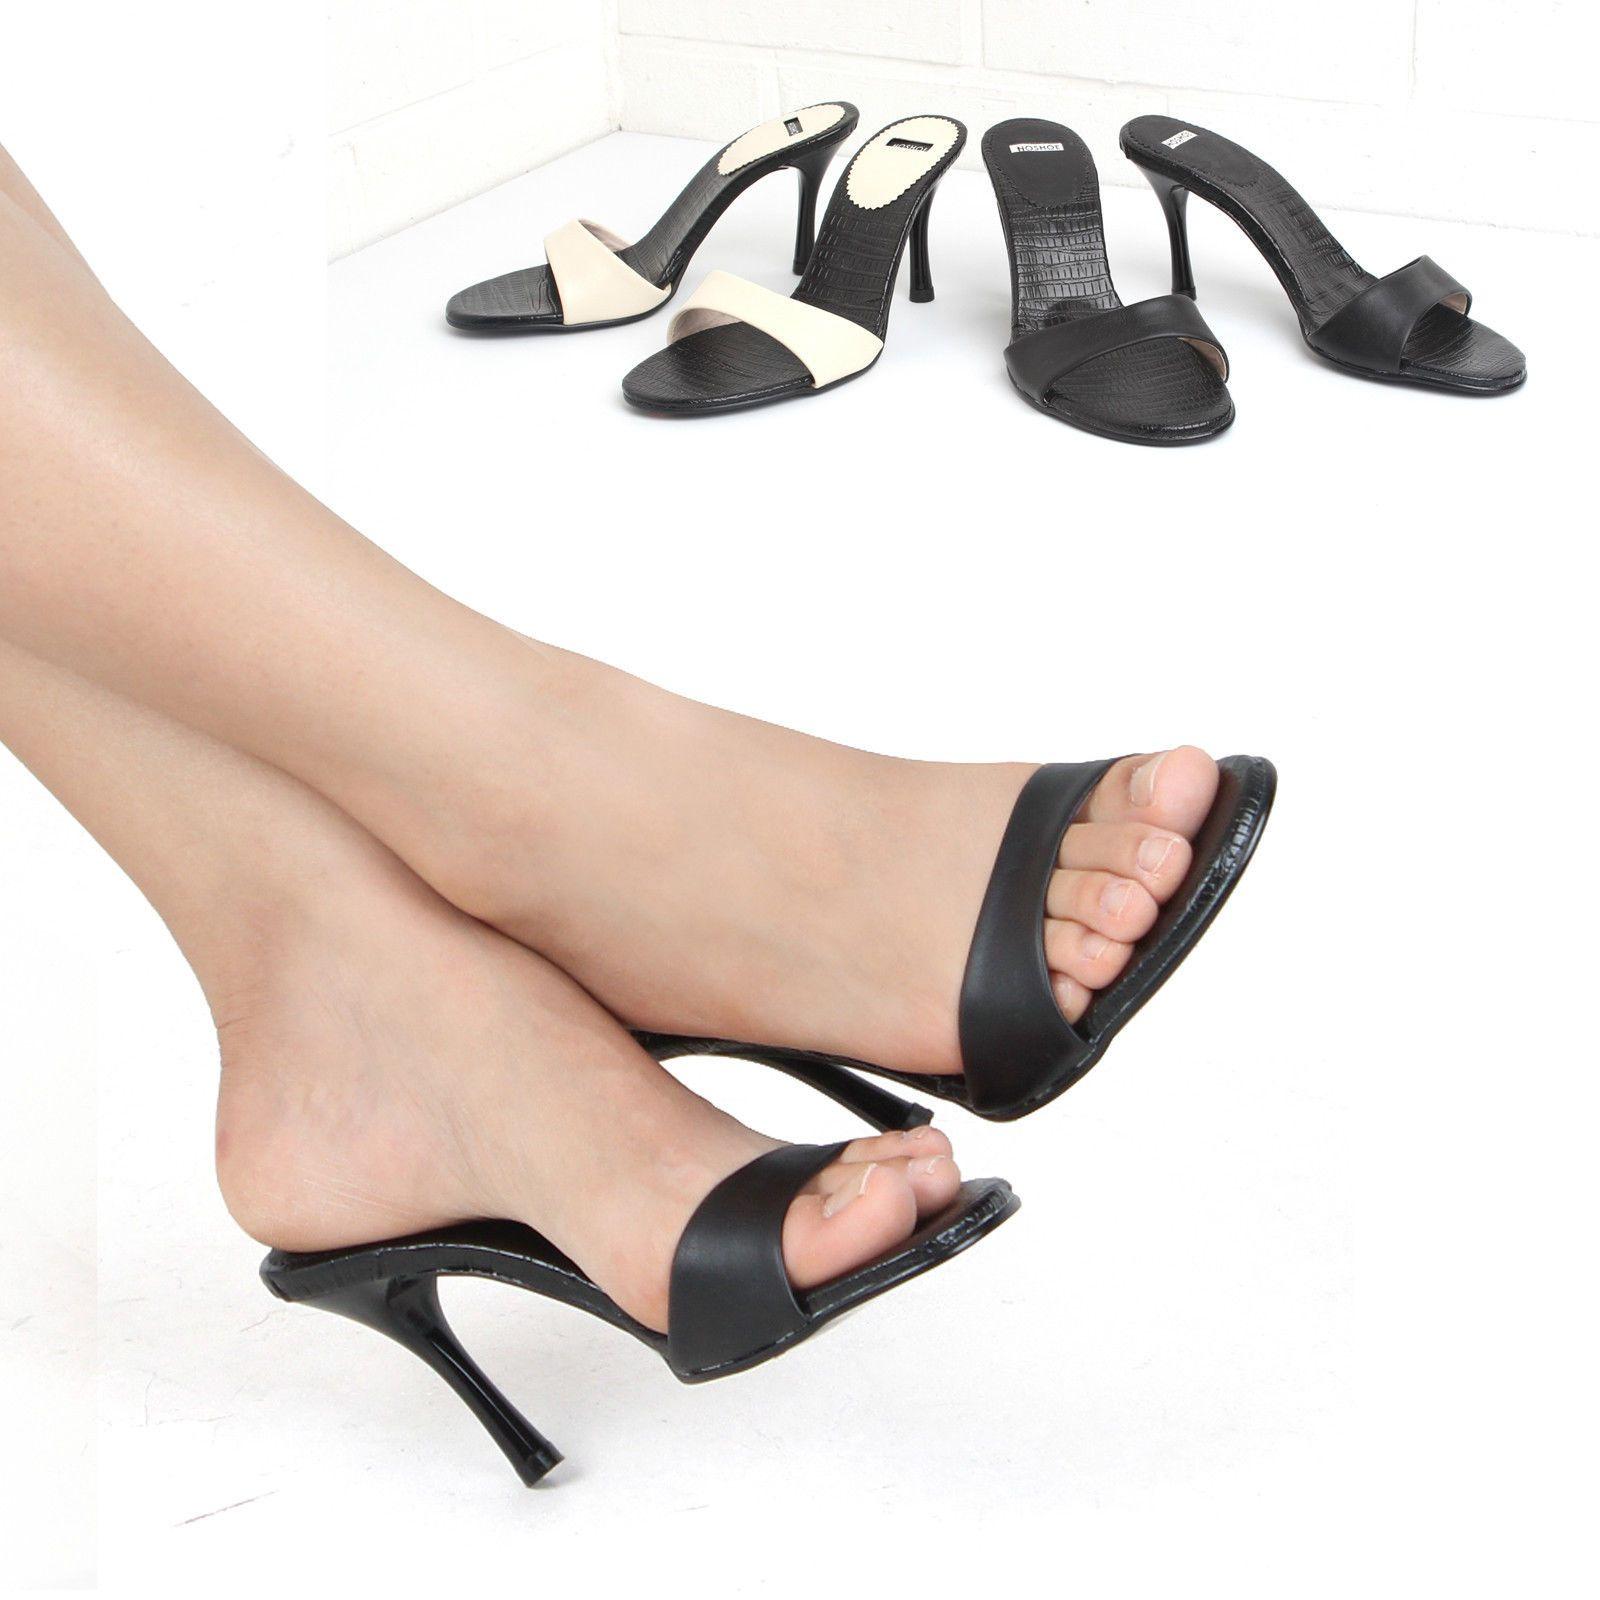 8ad4fd3c054 HS 8001] Sexy Ladies Mule Sandals high heels in Women's Shoes US 5 ...